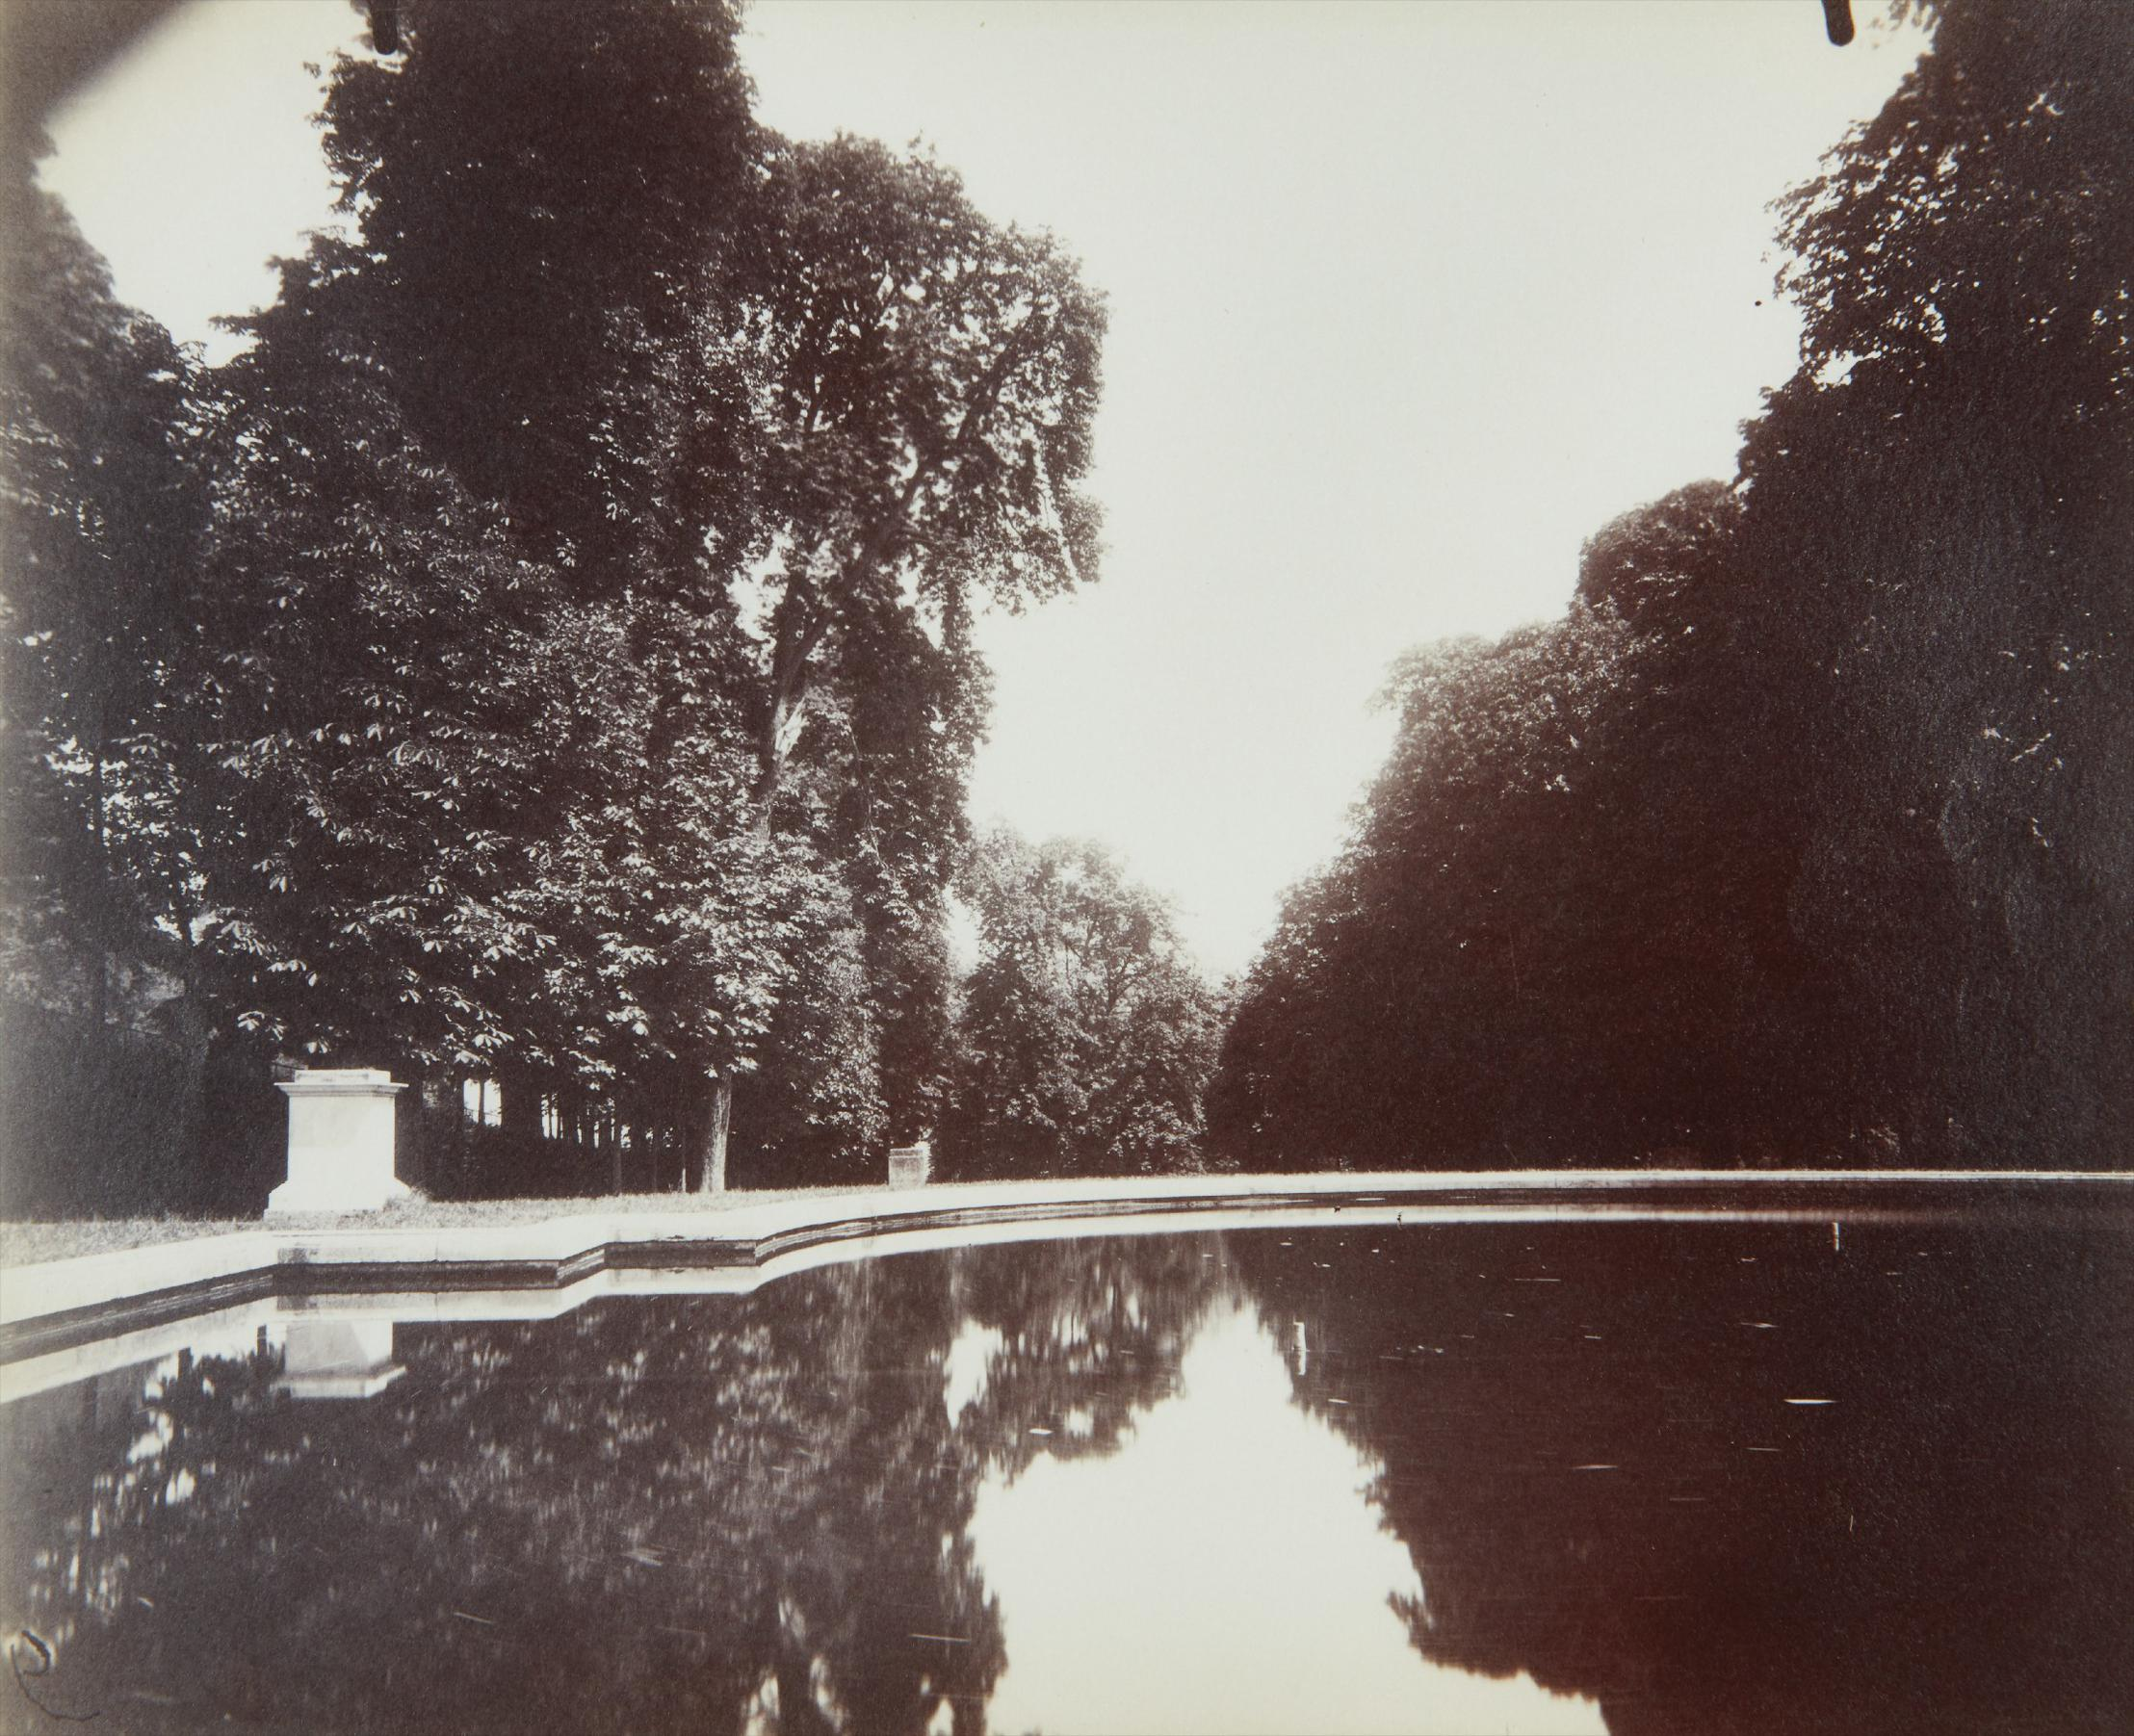 Eugene Atget-Saint-Cloud-1921